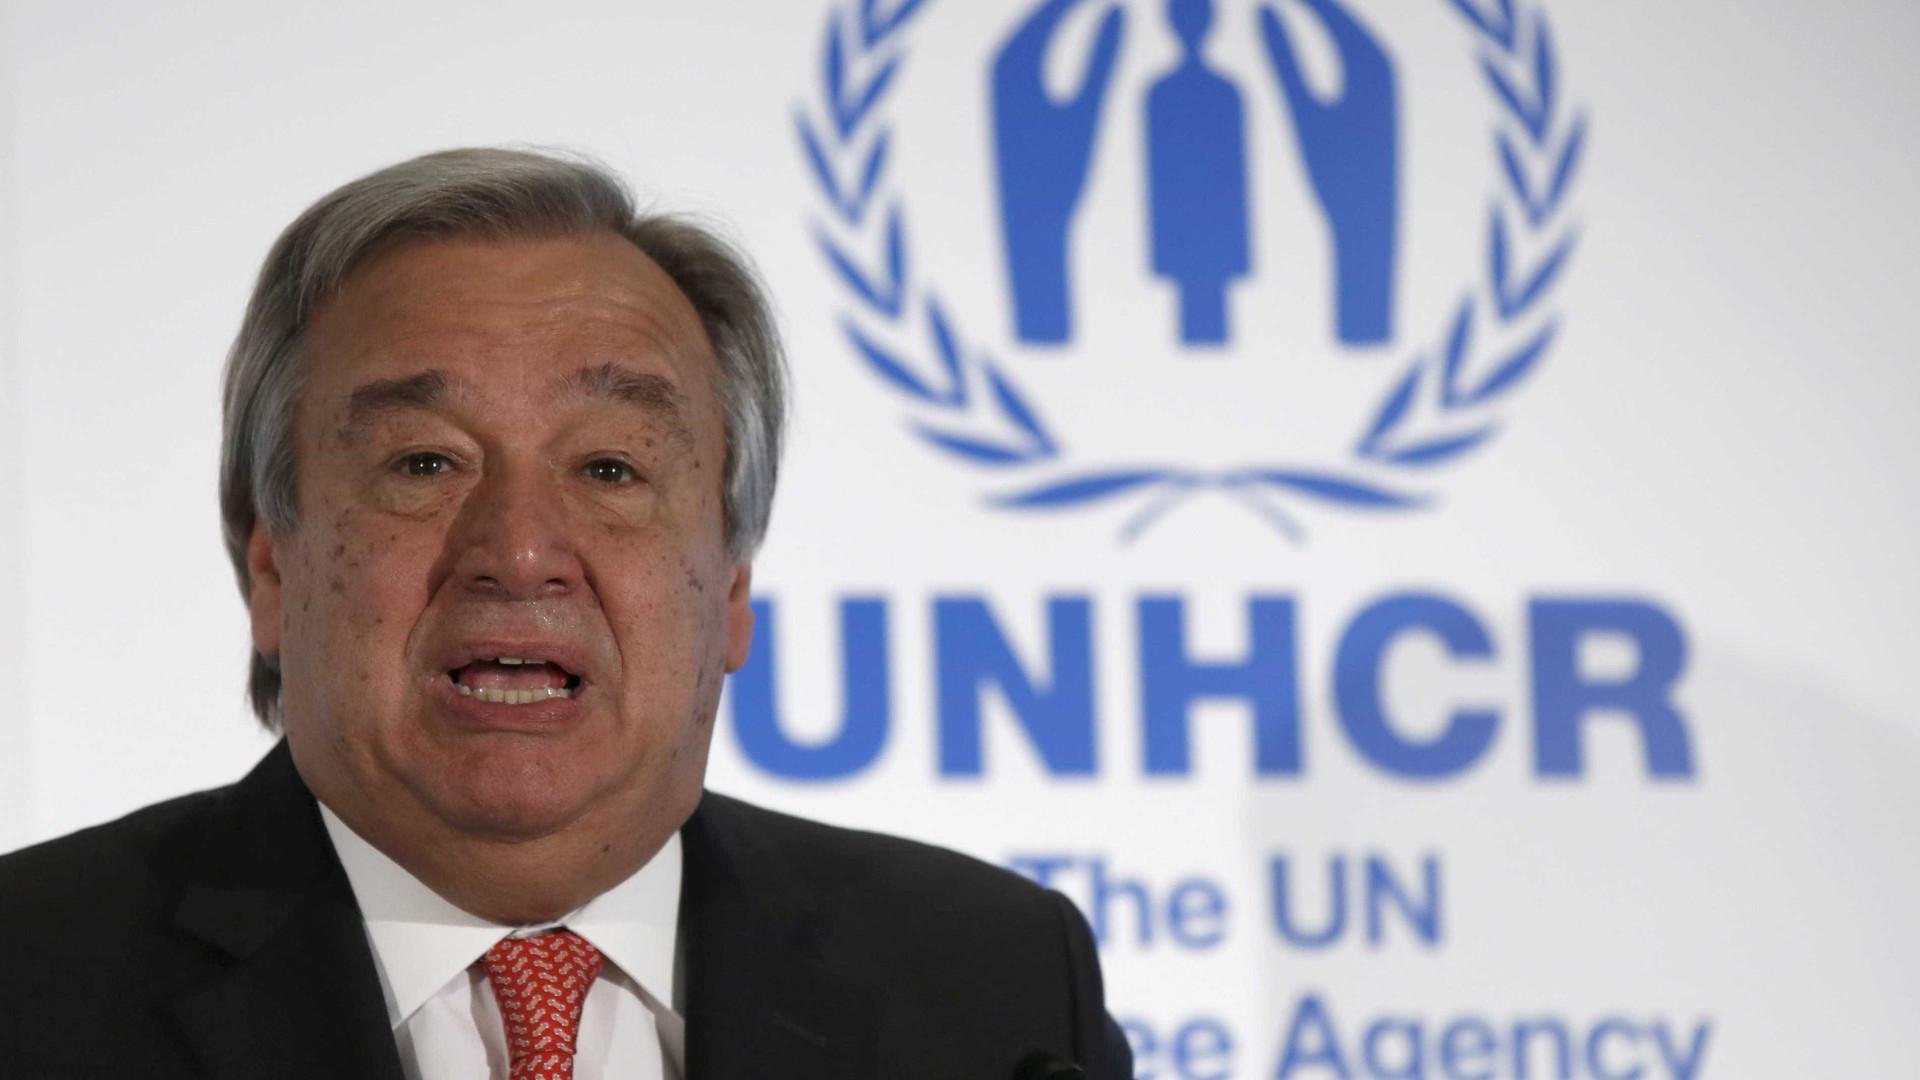 Migrações: Credibilidade de pacto global dependerá de compromissos nacionais - Guterres